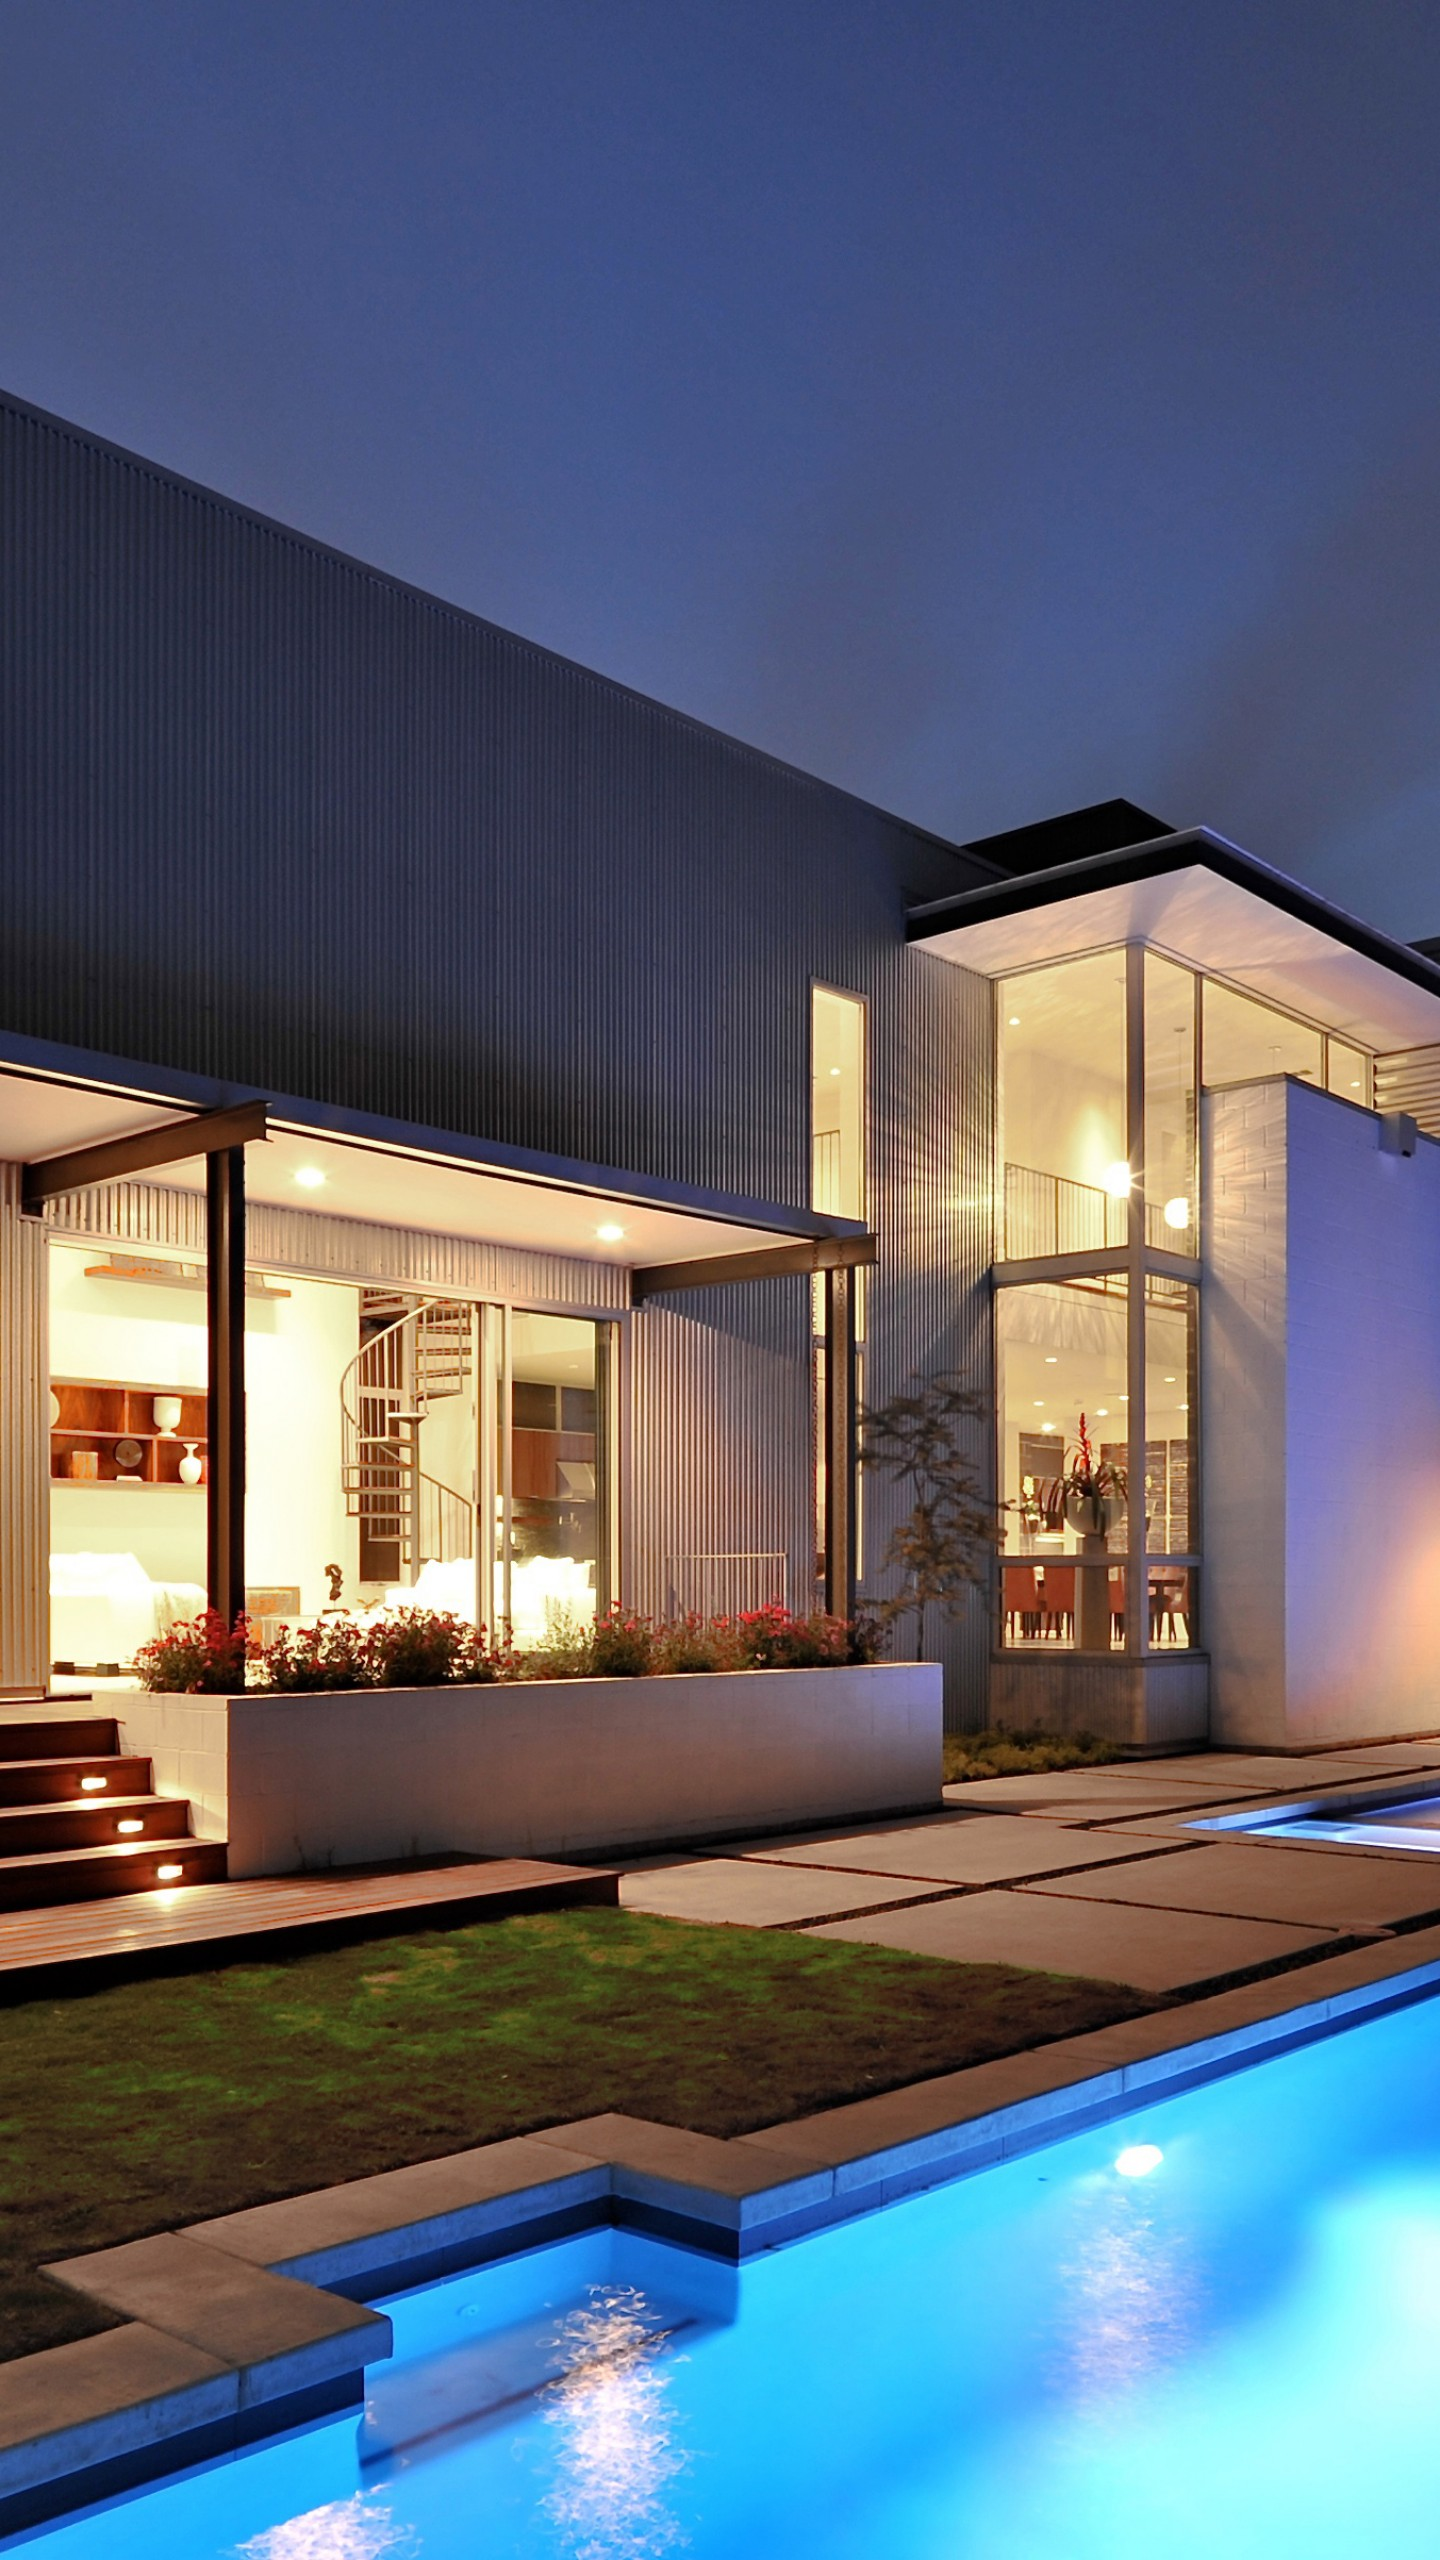 Wallpaper house mansion pool modern interior high tech